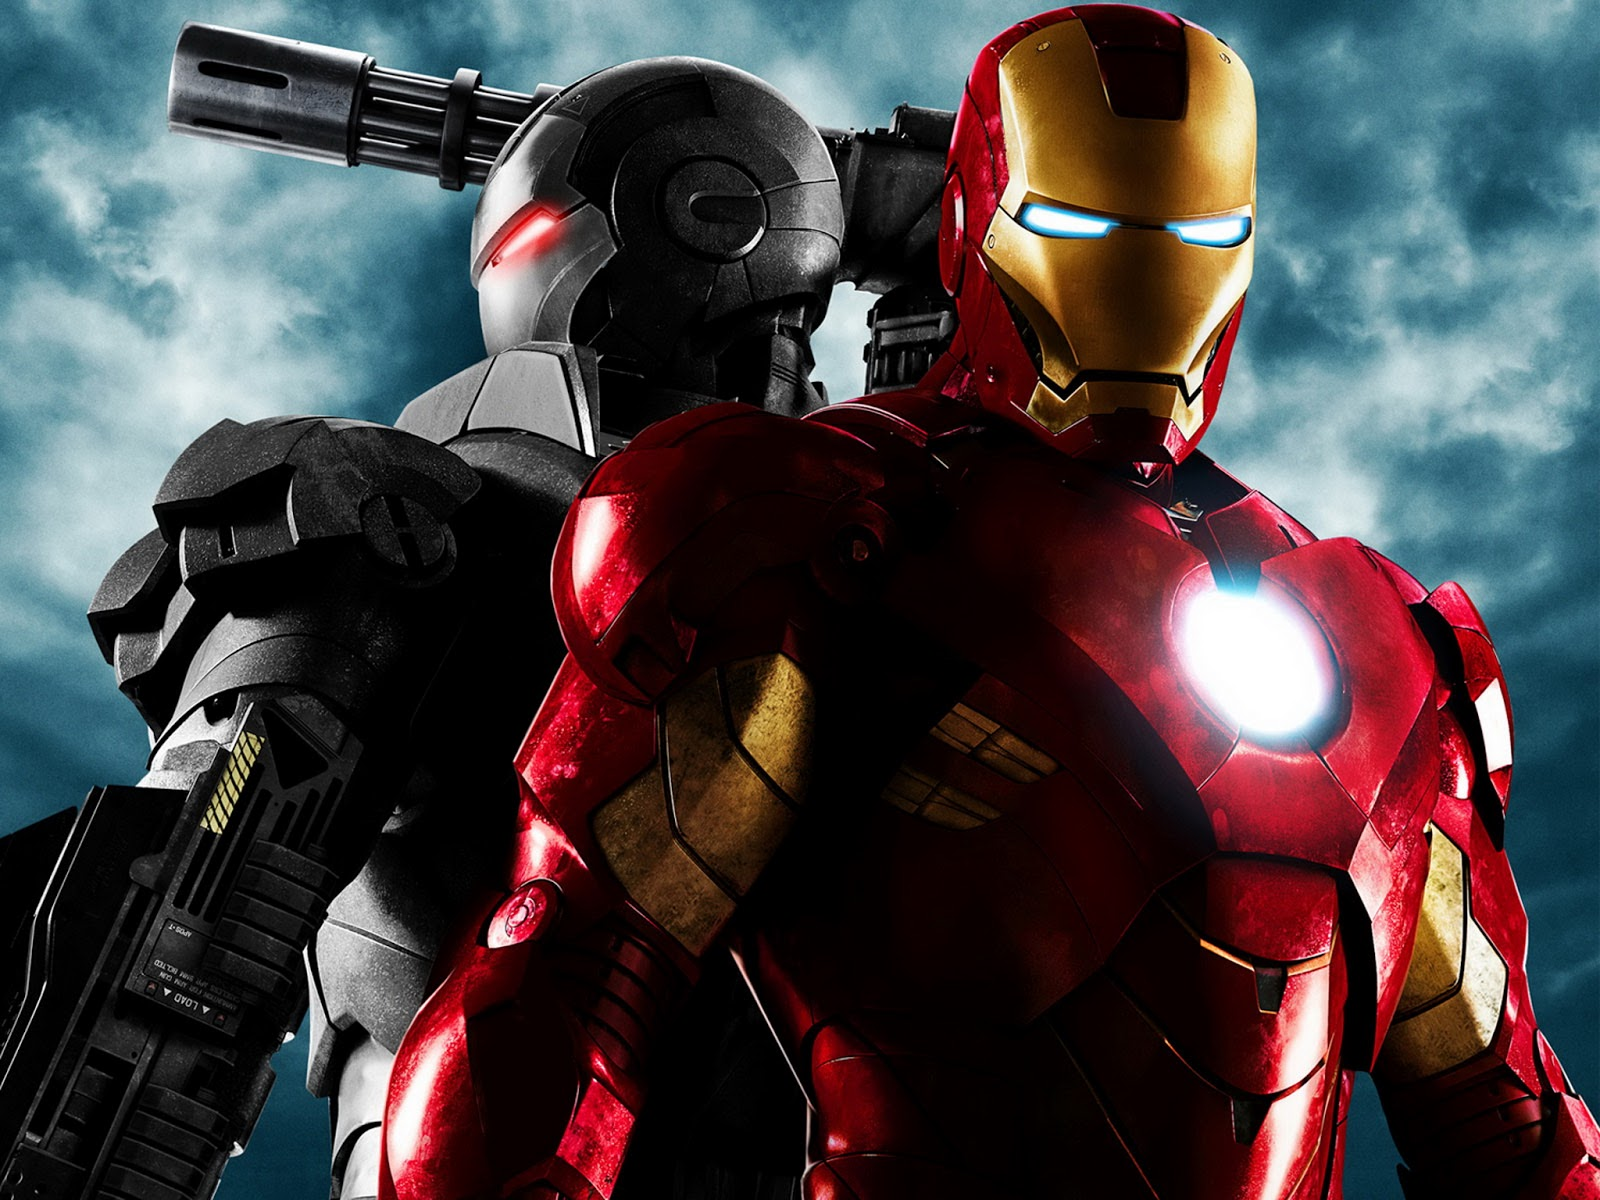 wonderful wallpapers: iron man 3 hd wallpapers 2013-2014